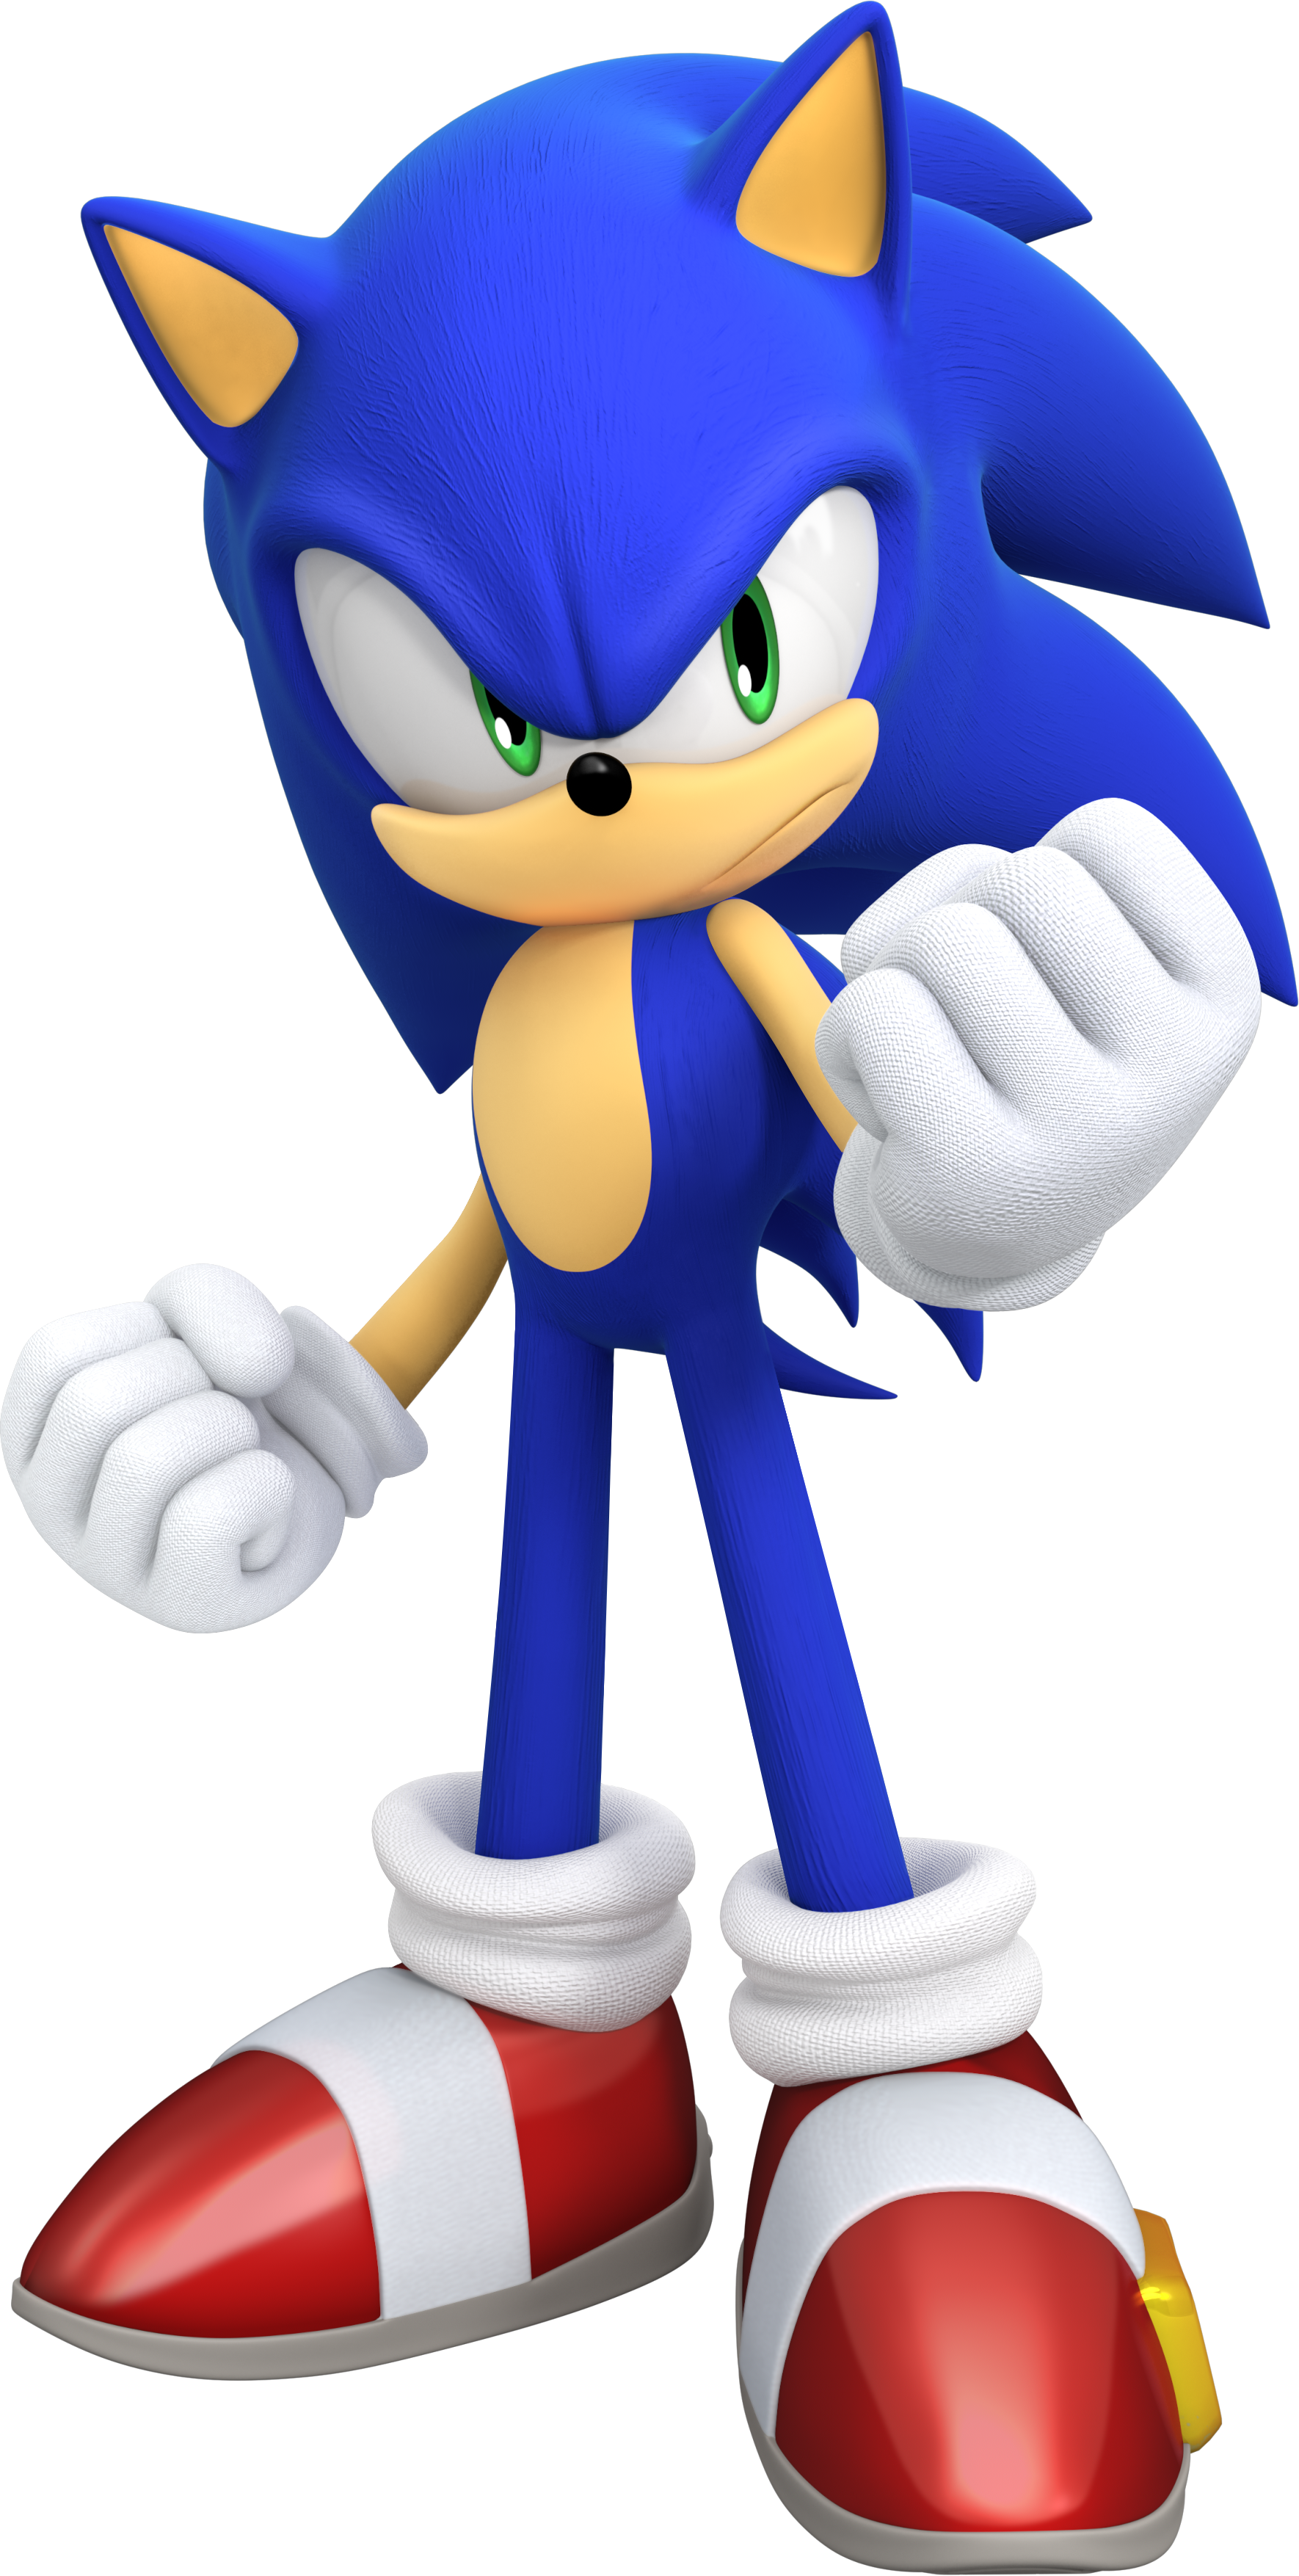 Sonic the Hedgehog (Classic Sonics world) | Sonic News